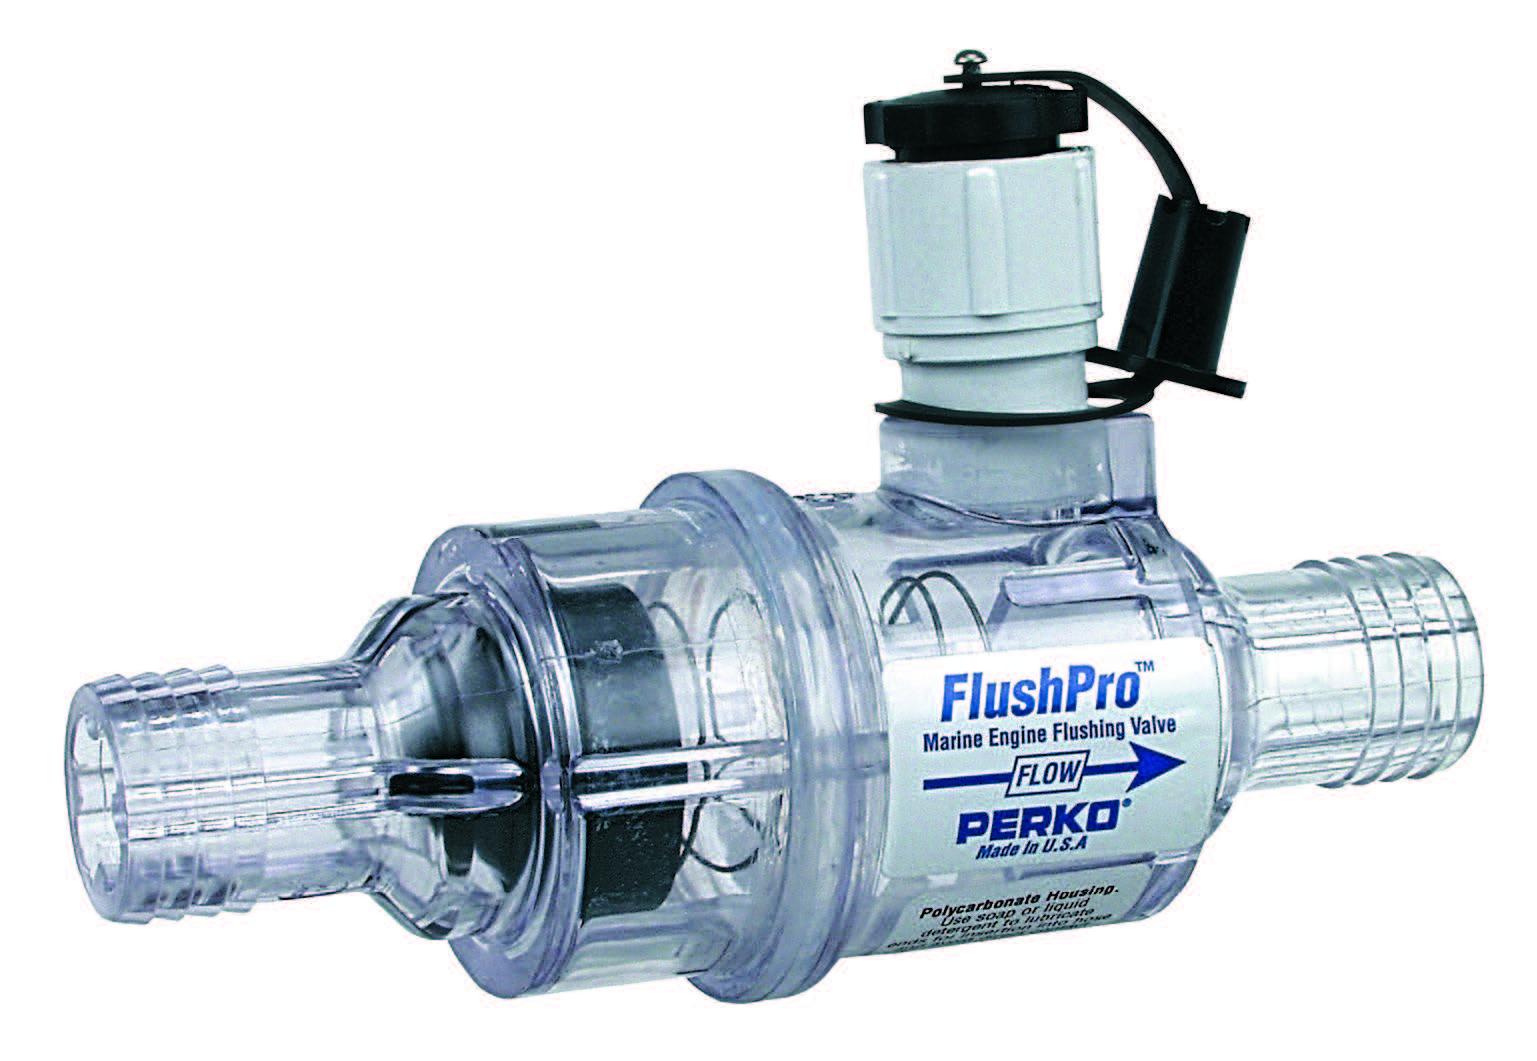 Perko flush pro instructions